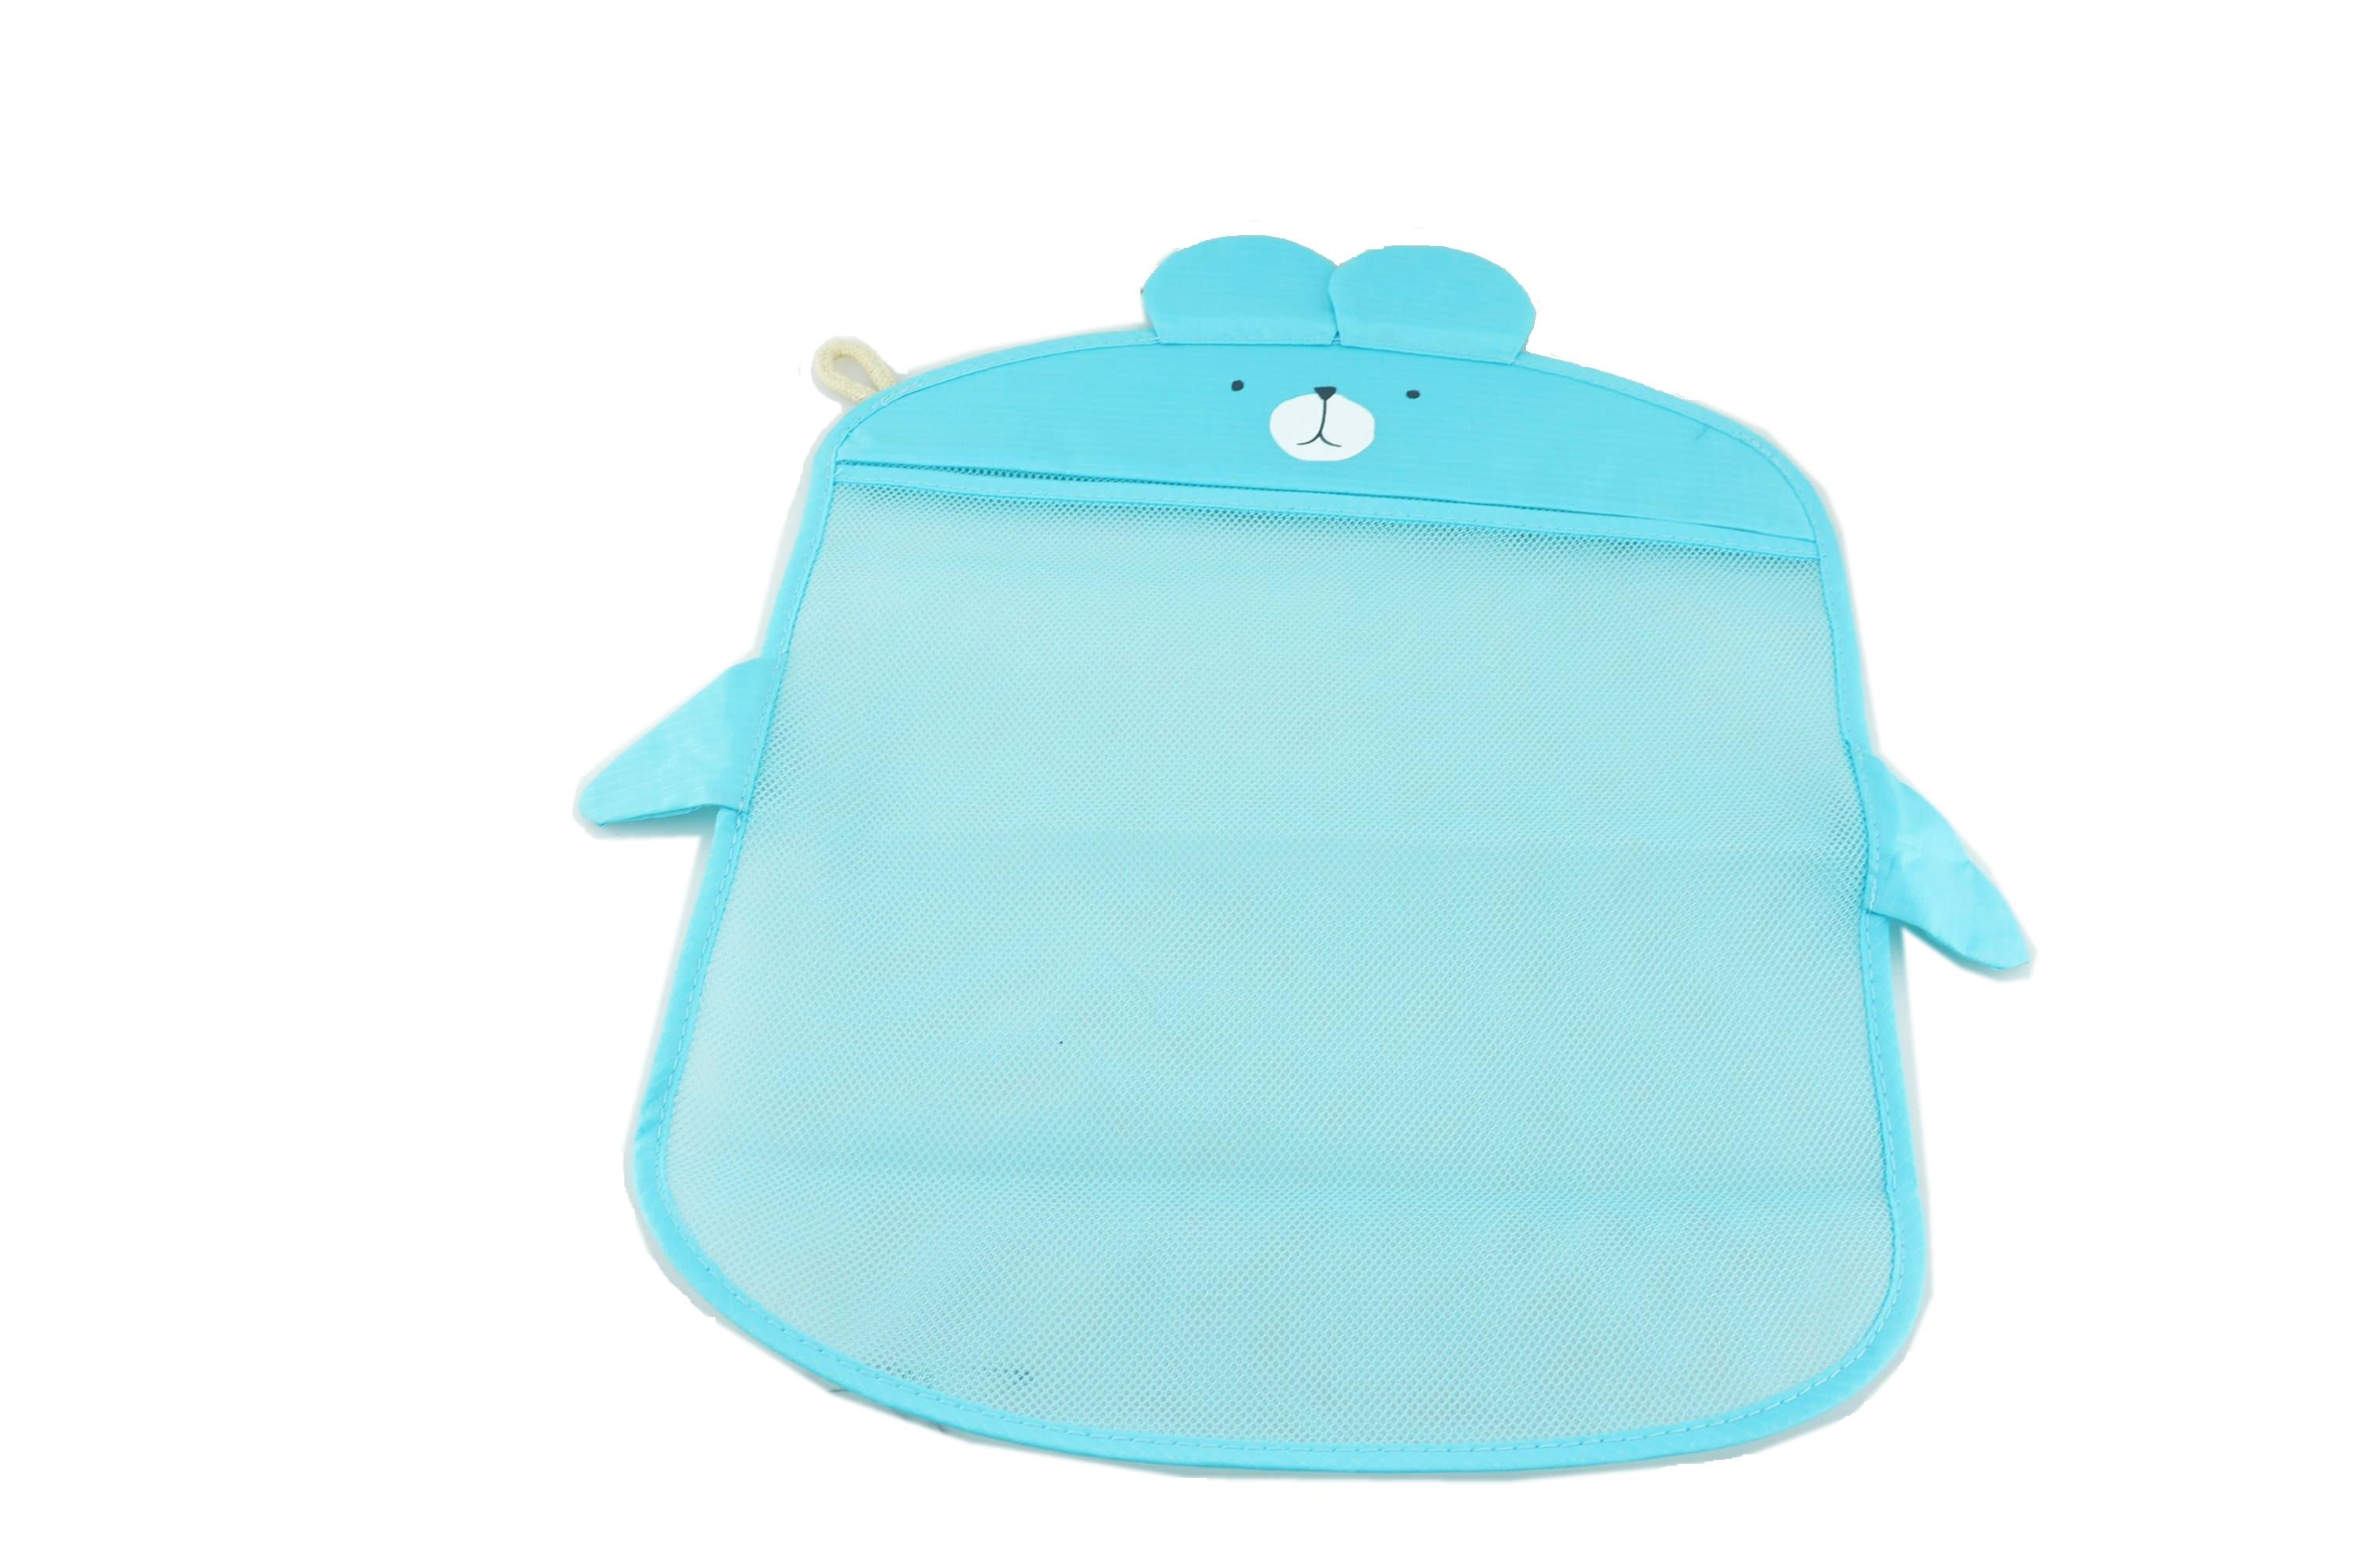 Pink Baby Bathroom Mesh Bag Child Bath Toy Bag Net Animal Shape Cloth Toy furniture bags